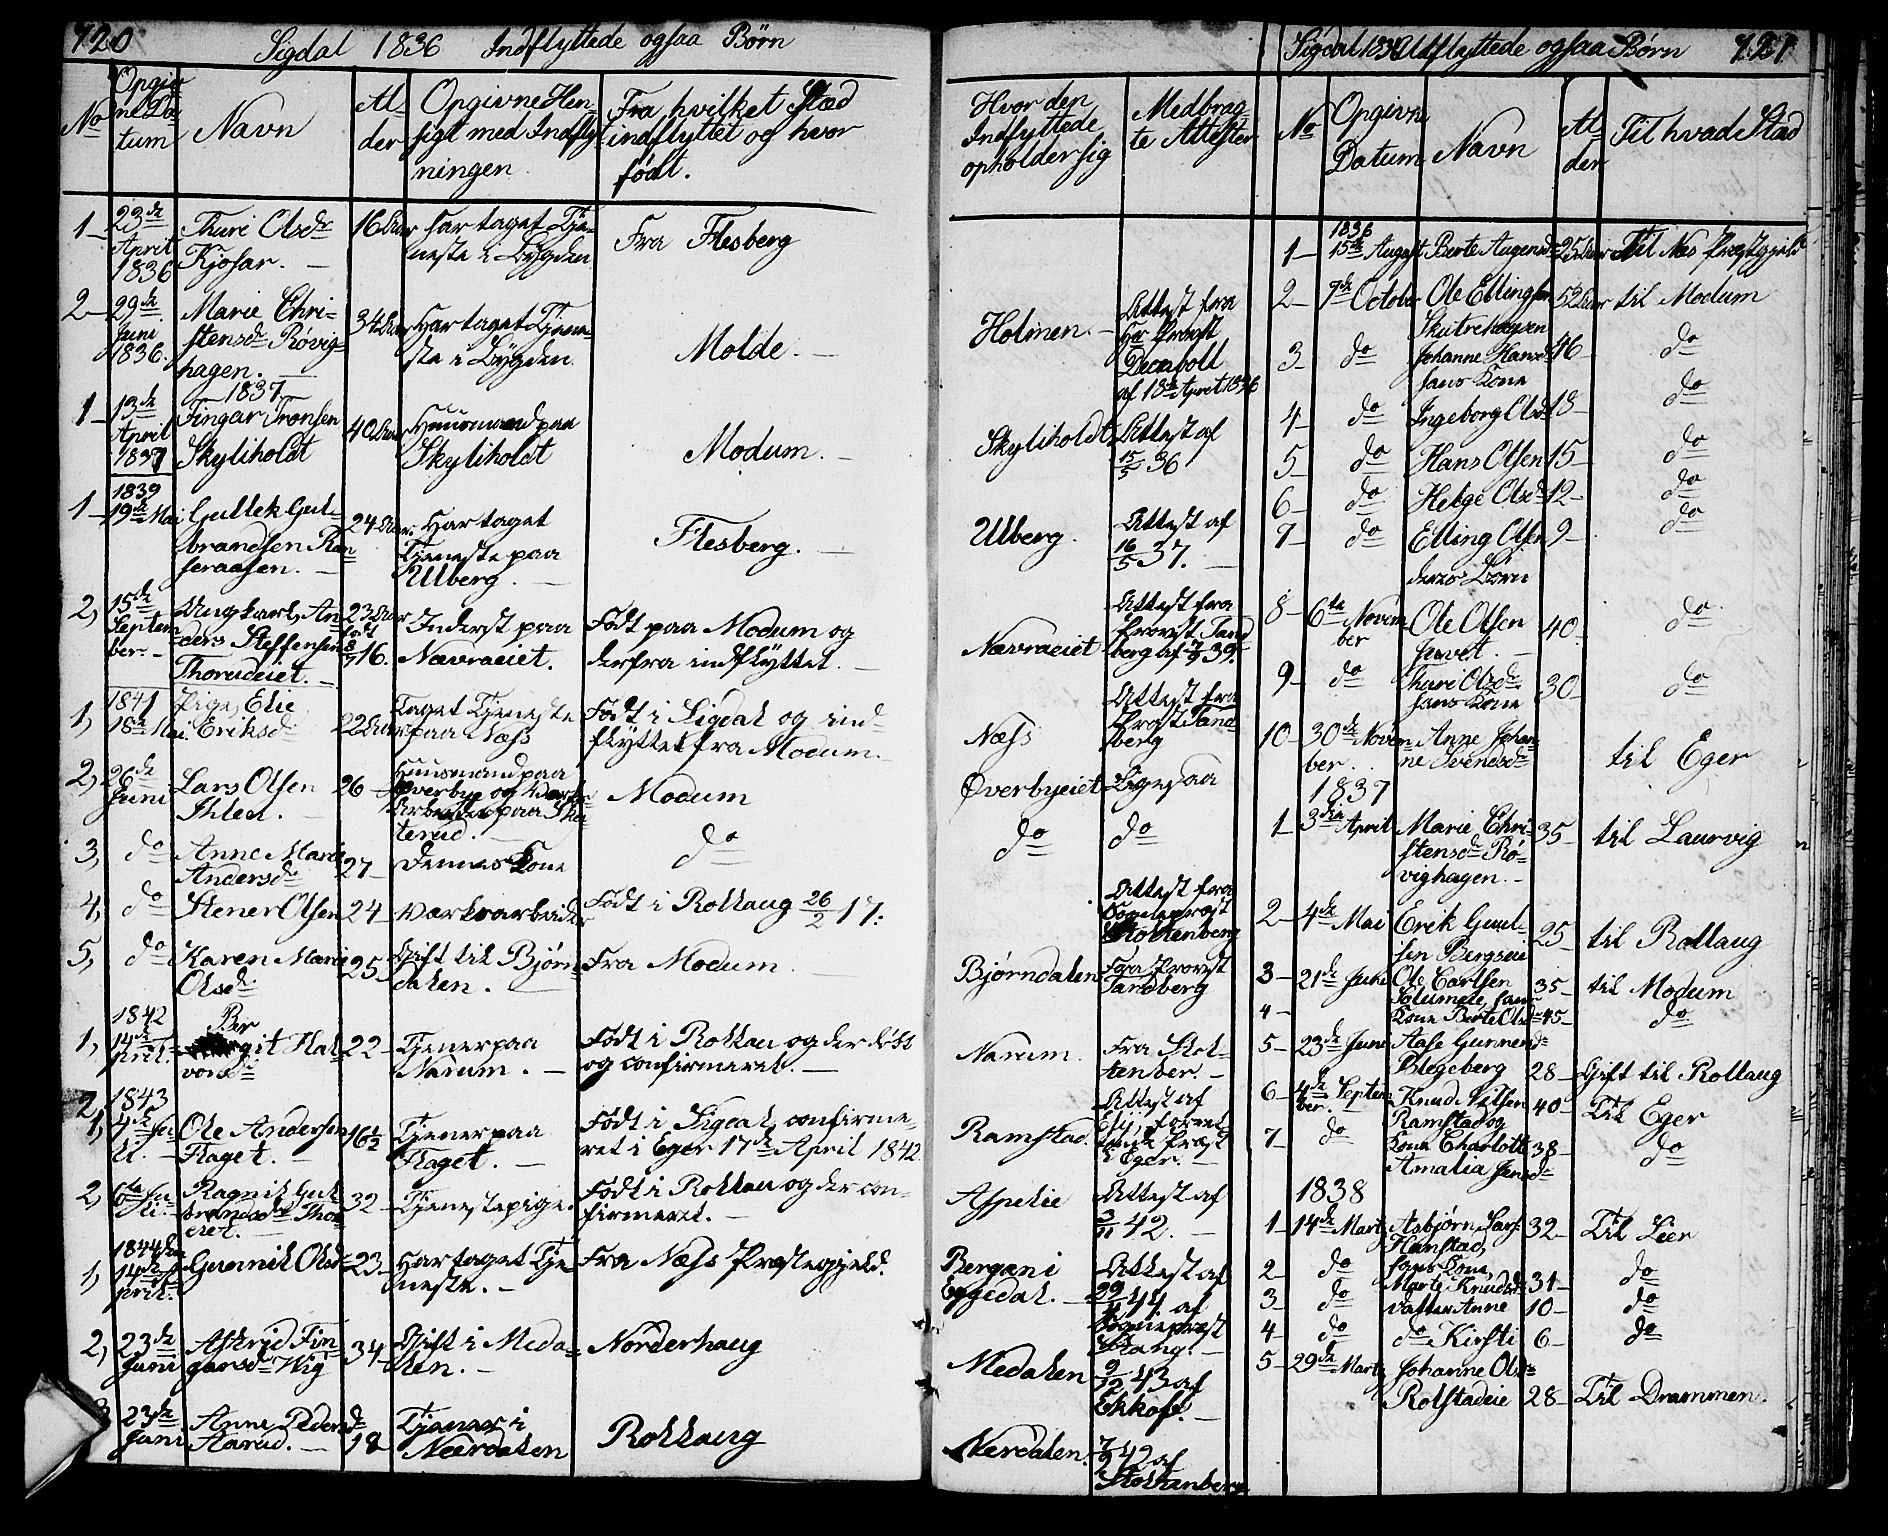 SAKO, Sigdal kirkebøker, G/Ga/L0002: Klokkerbok nr. I 2, 1835-1856, s. 720-721